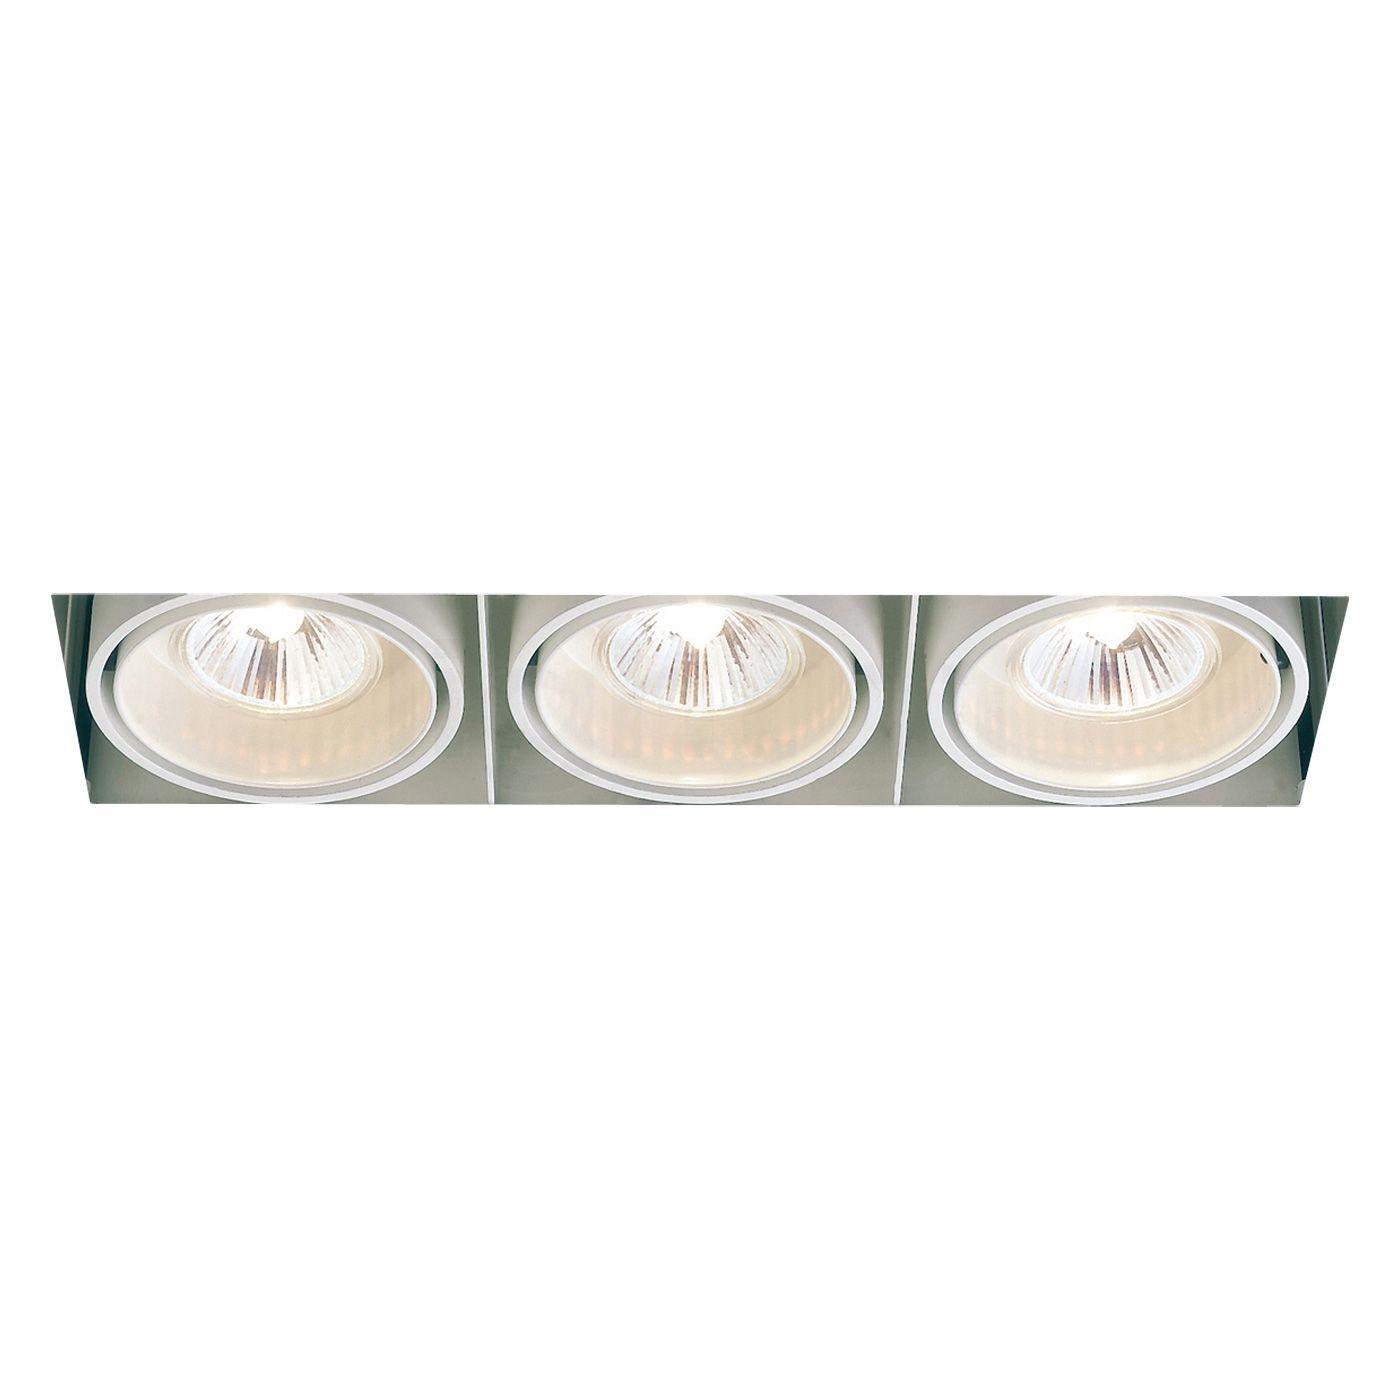 delta light minigrid in trimless 3 50 einbaustrahler. Black Bedroom Furniture Sets. Home Design Ideas